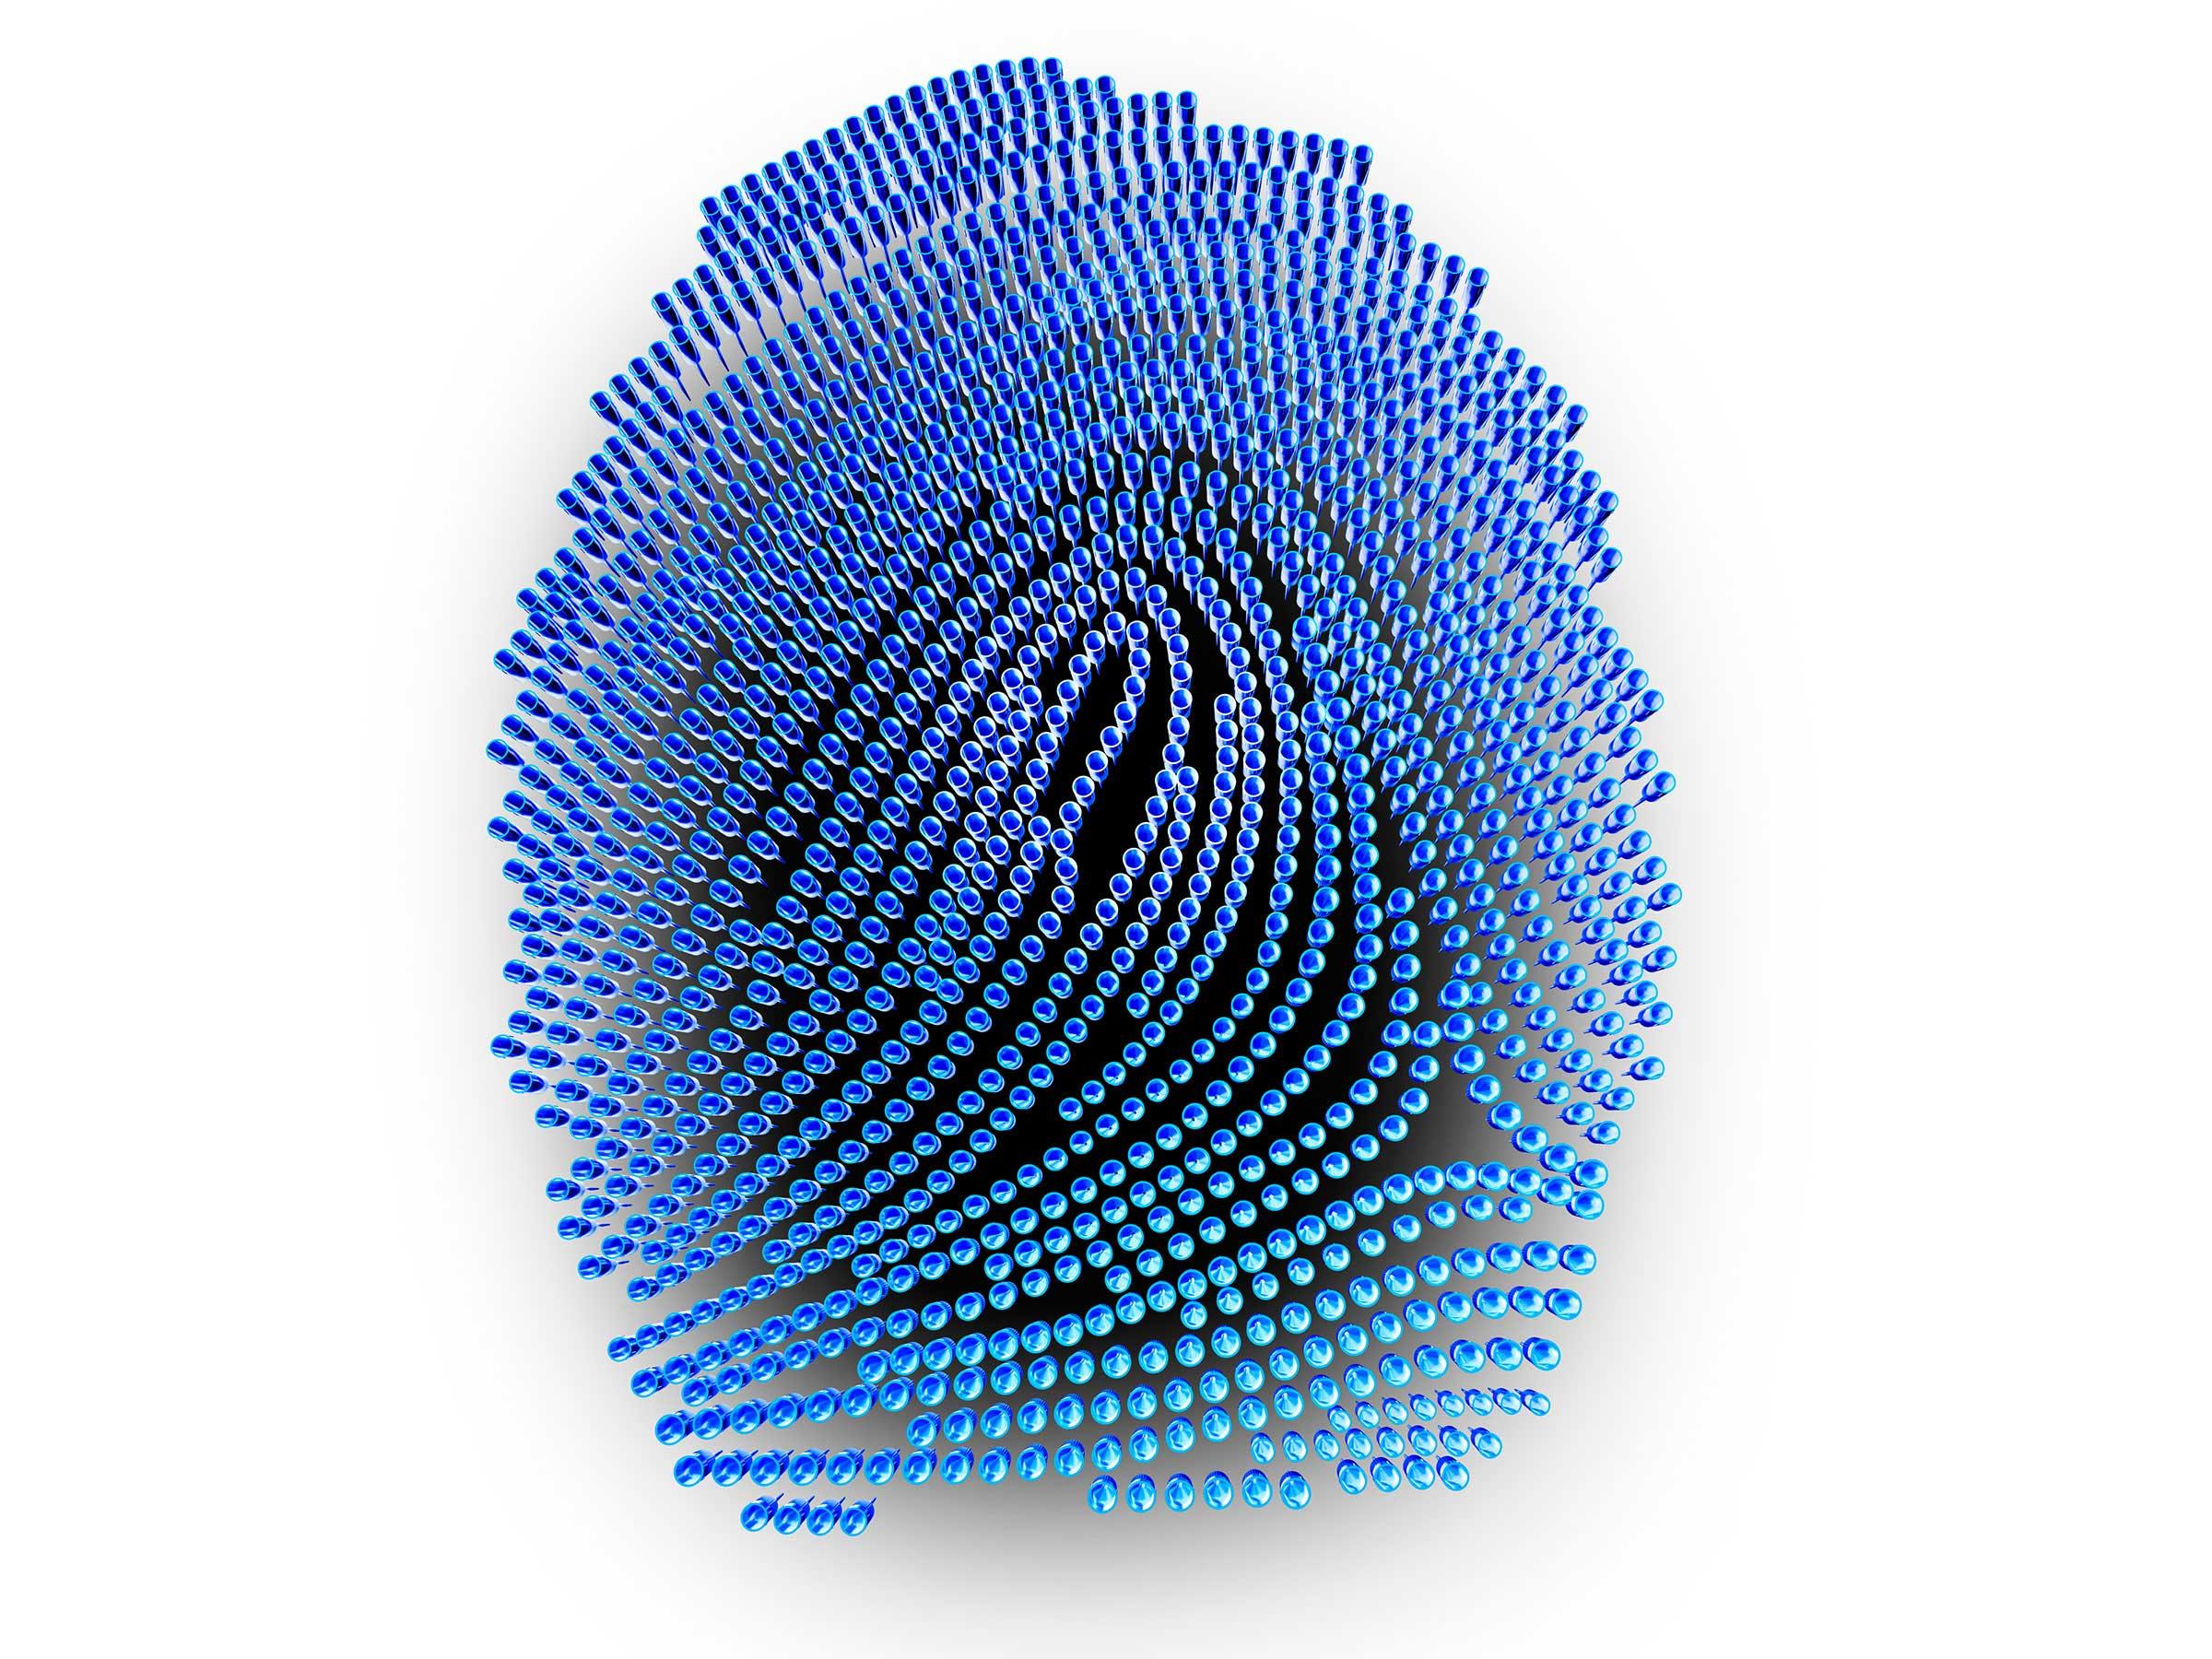 3-D-bio-vial-thumbprint - personal